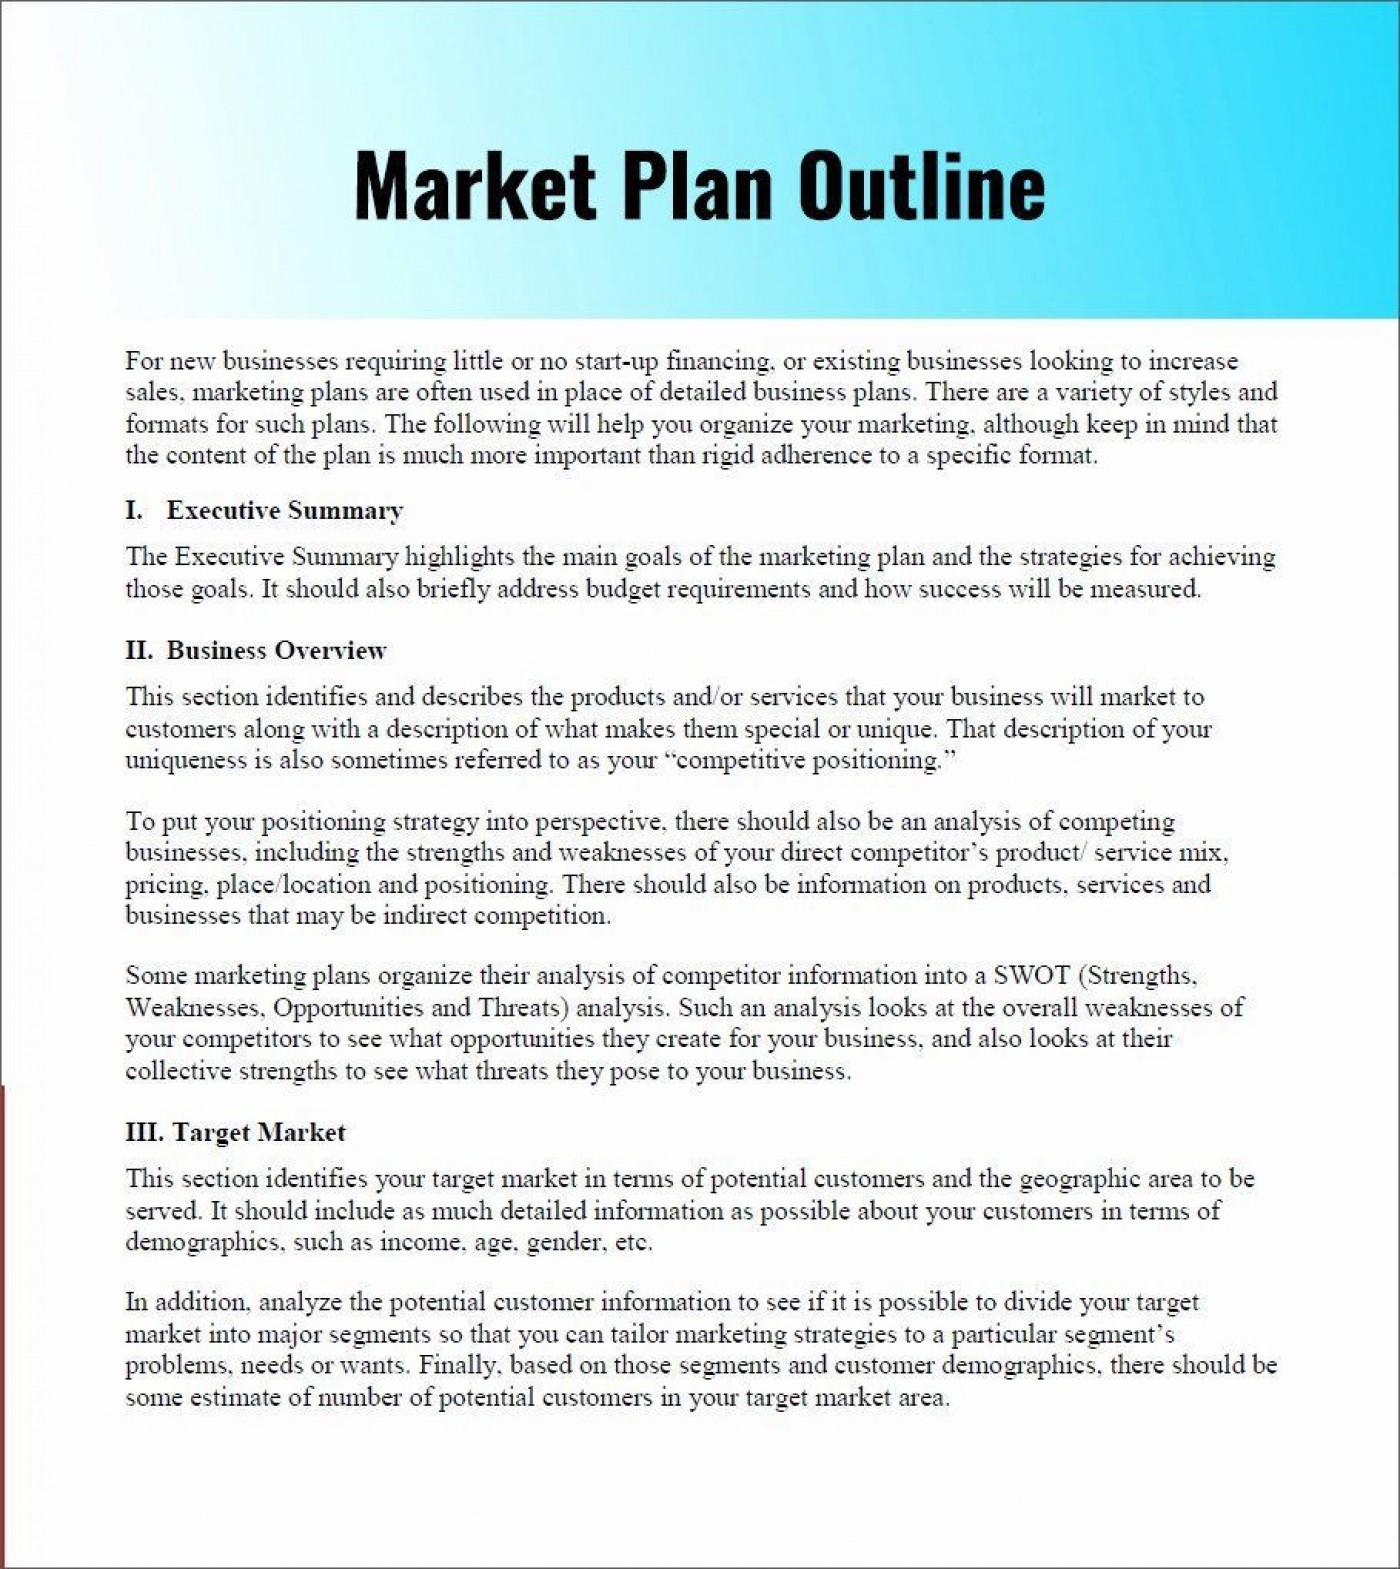 003 Best Restaurant Marketing Plan Template Free Download High Def 1400